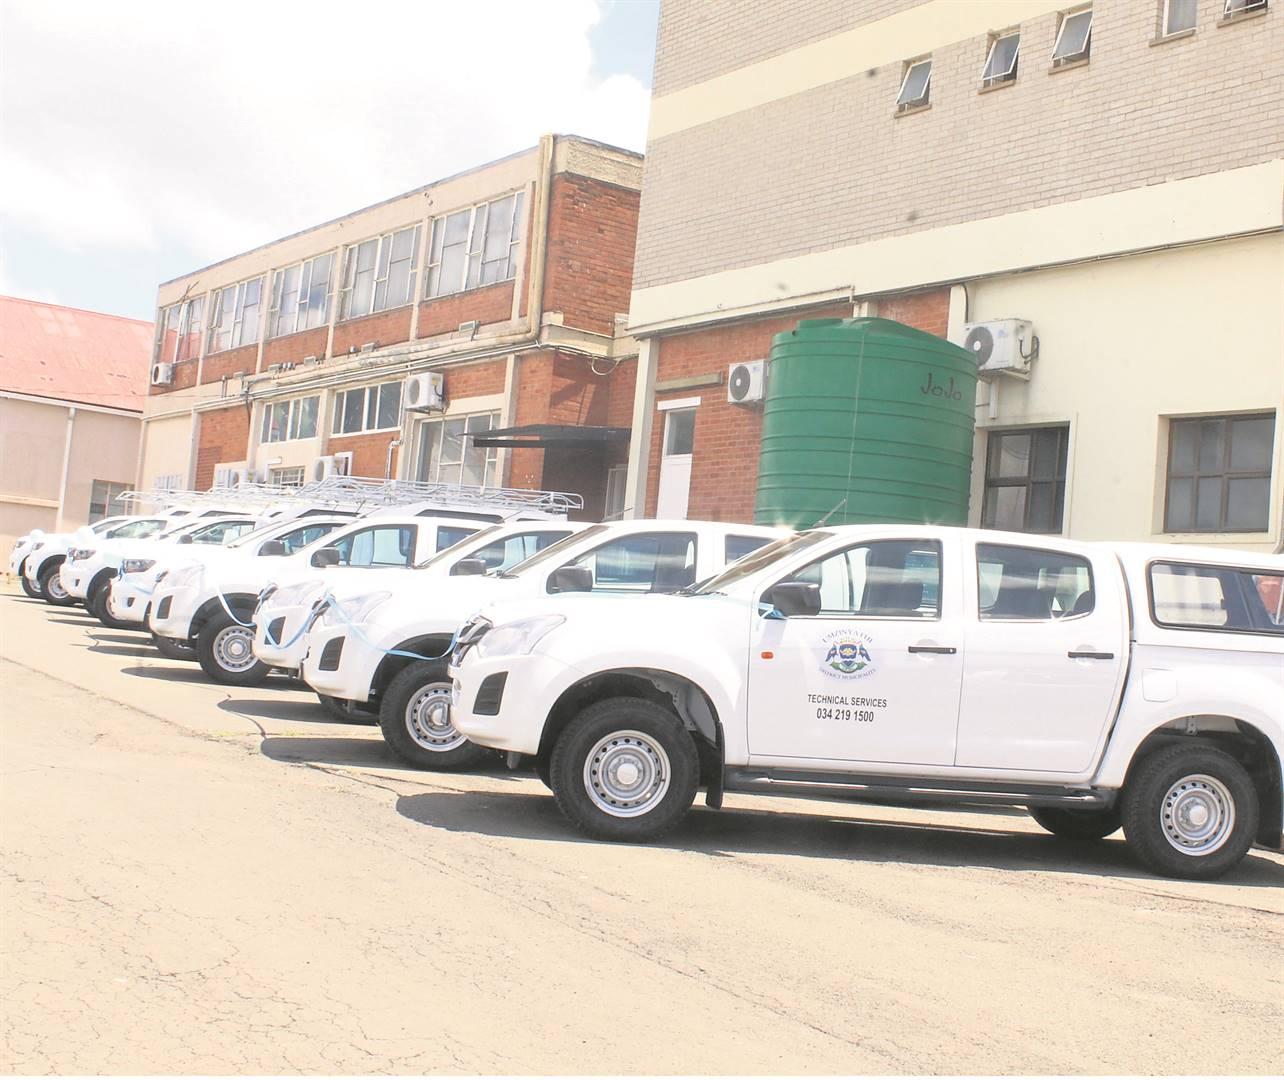 PHOTO: supplieduMzinyathi District Municipality bought another new fleet of vehicles.